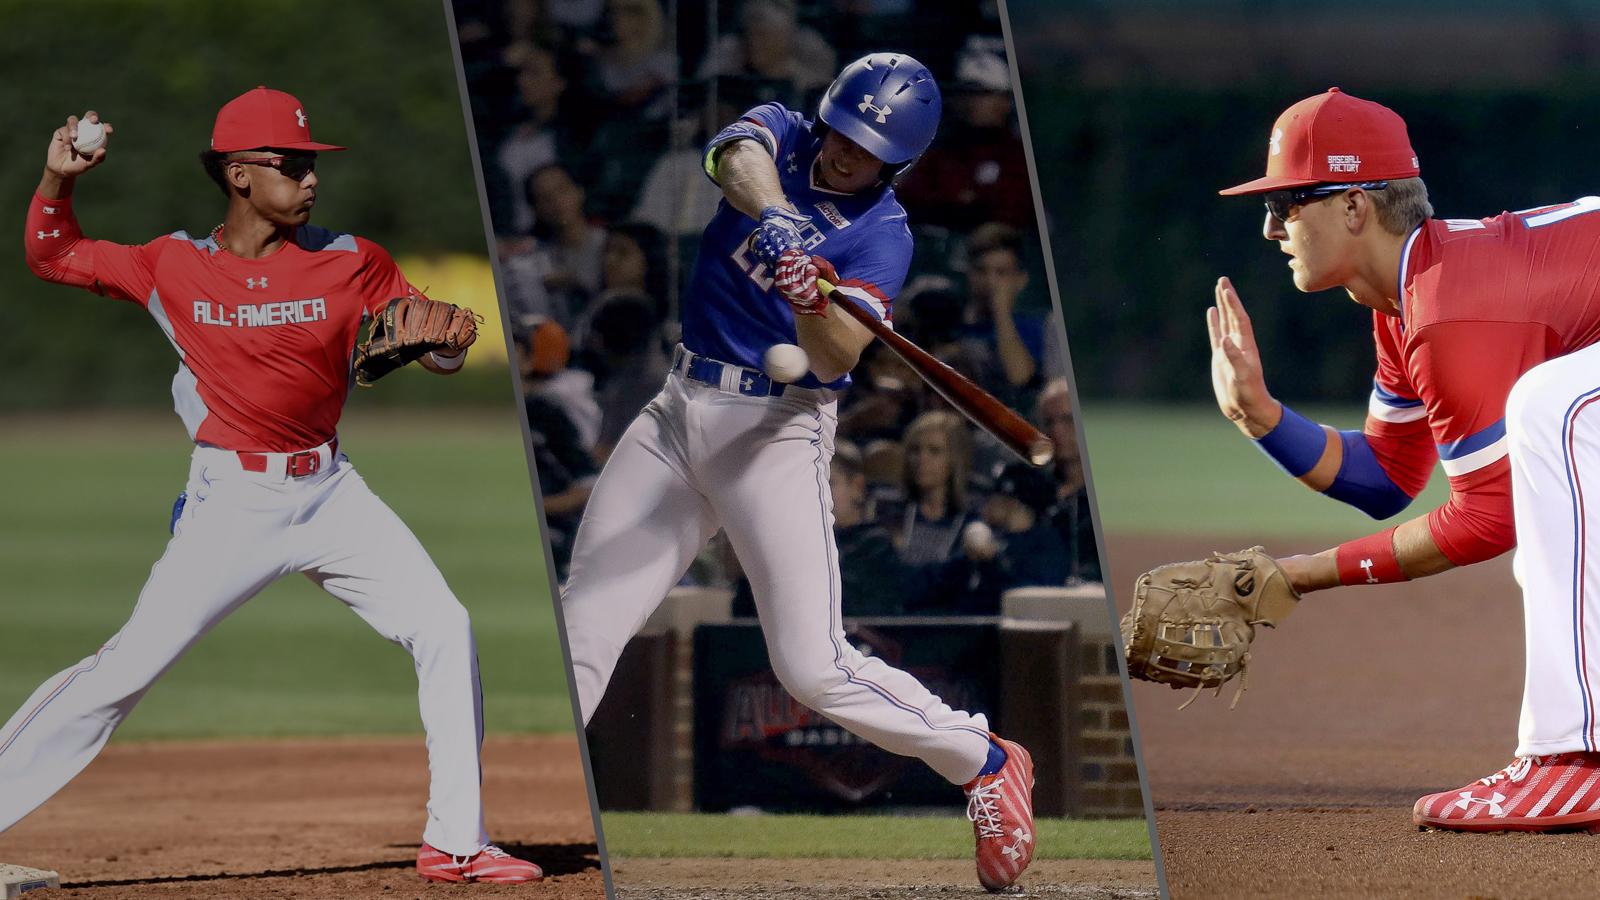 Top Performers in High School Baseball